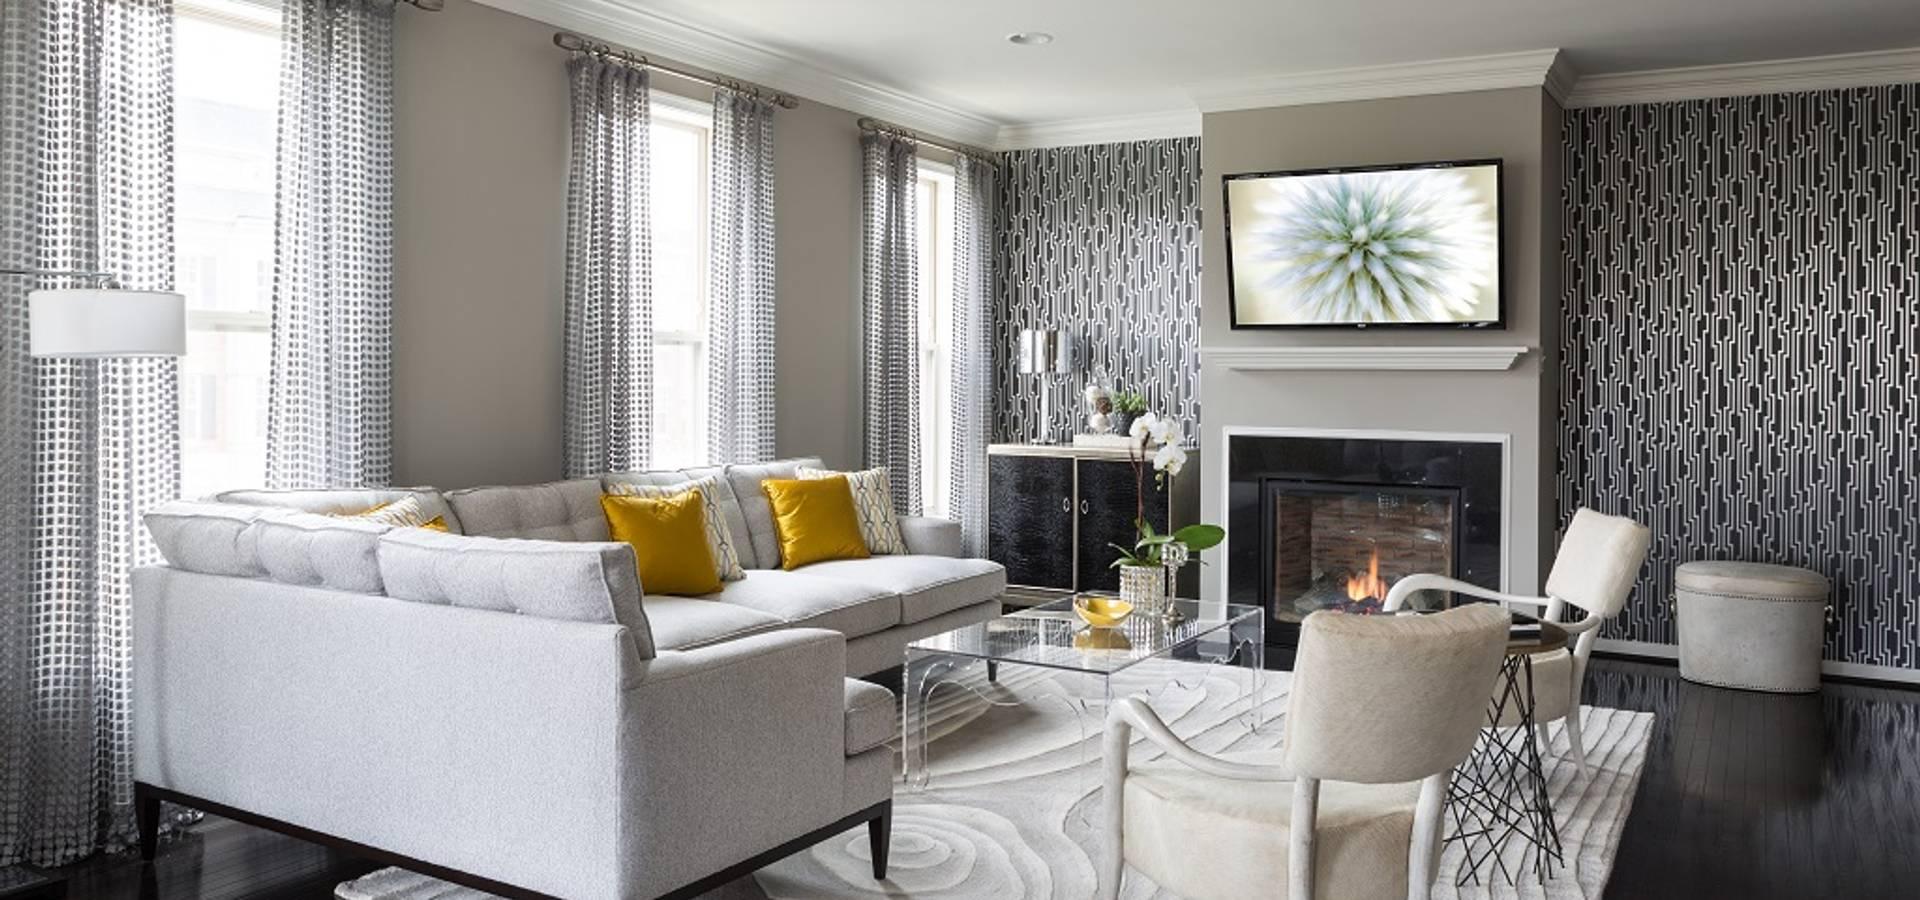 Lorna Gross Interior Design